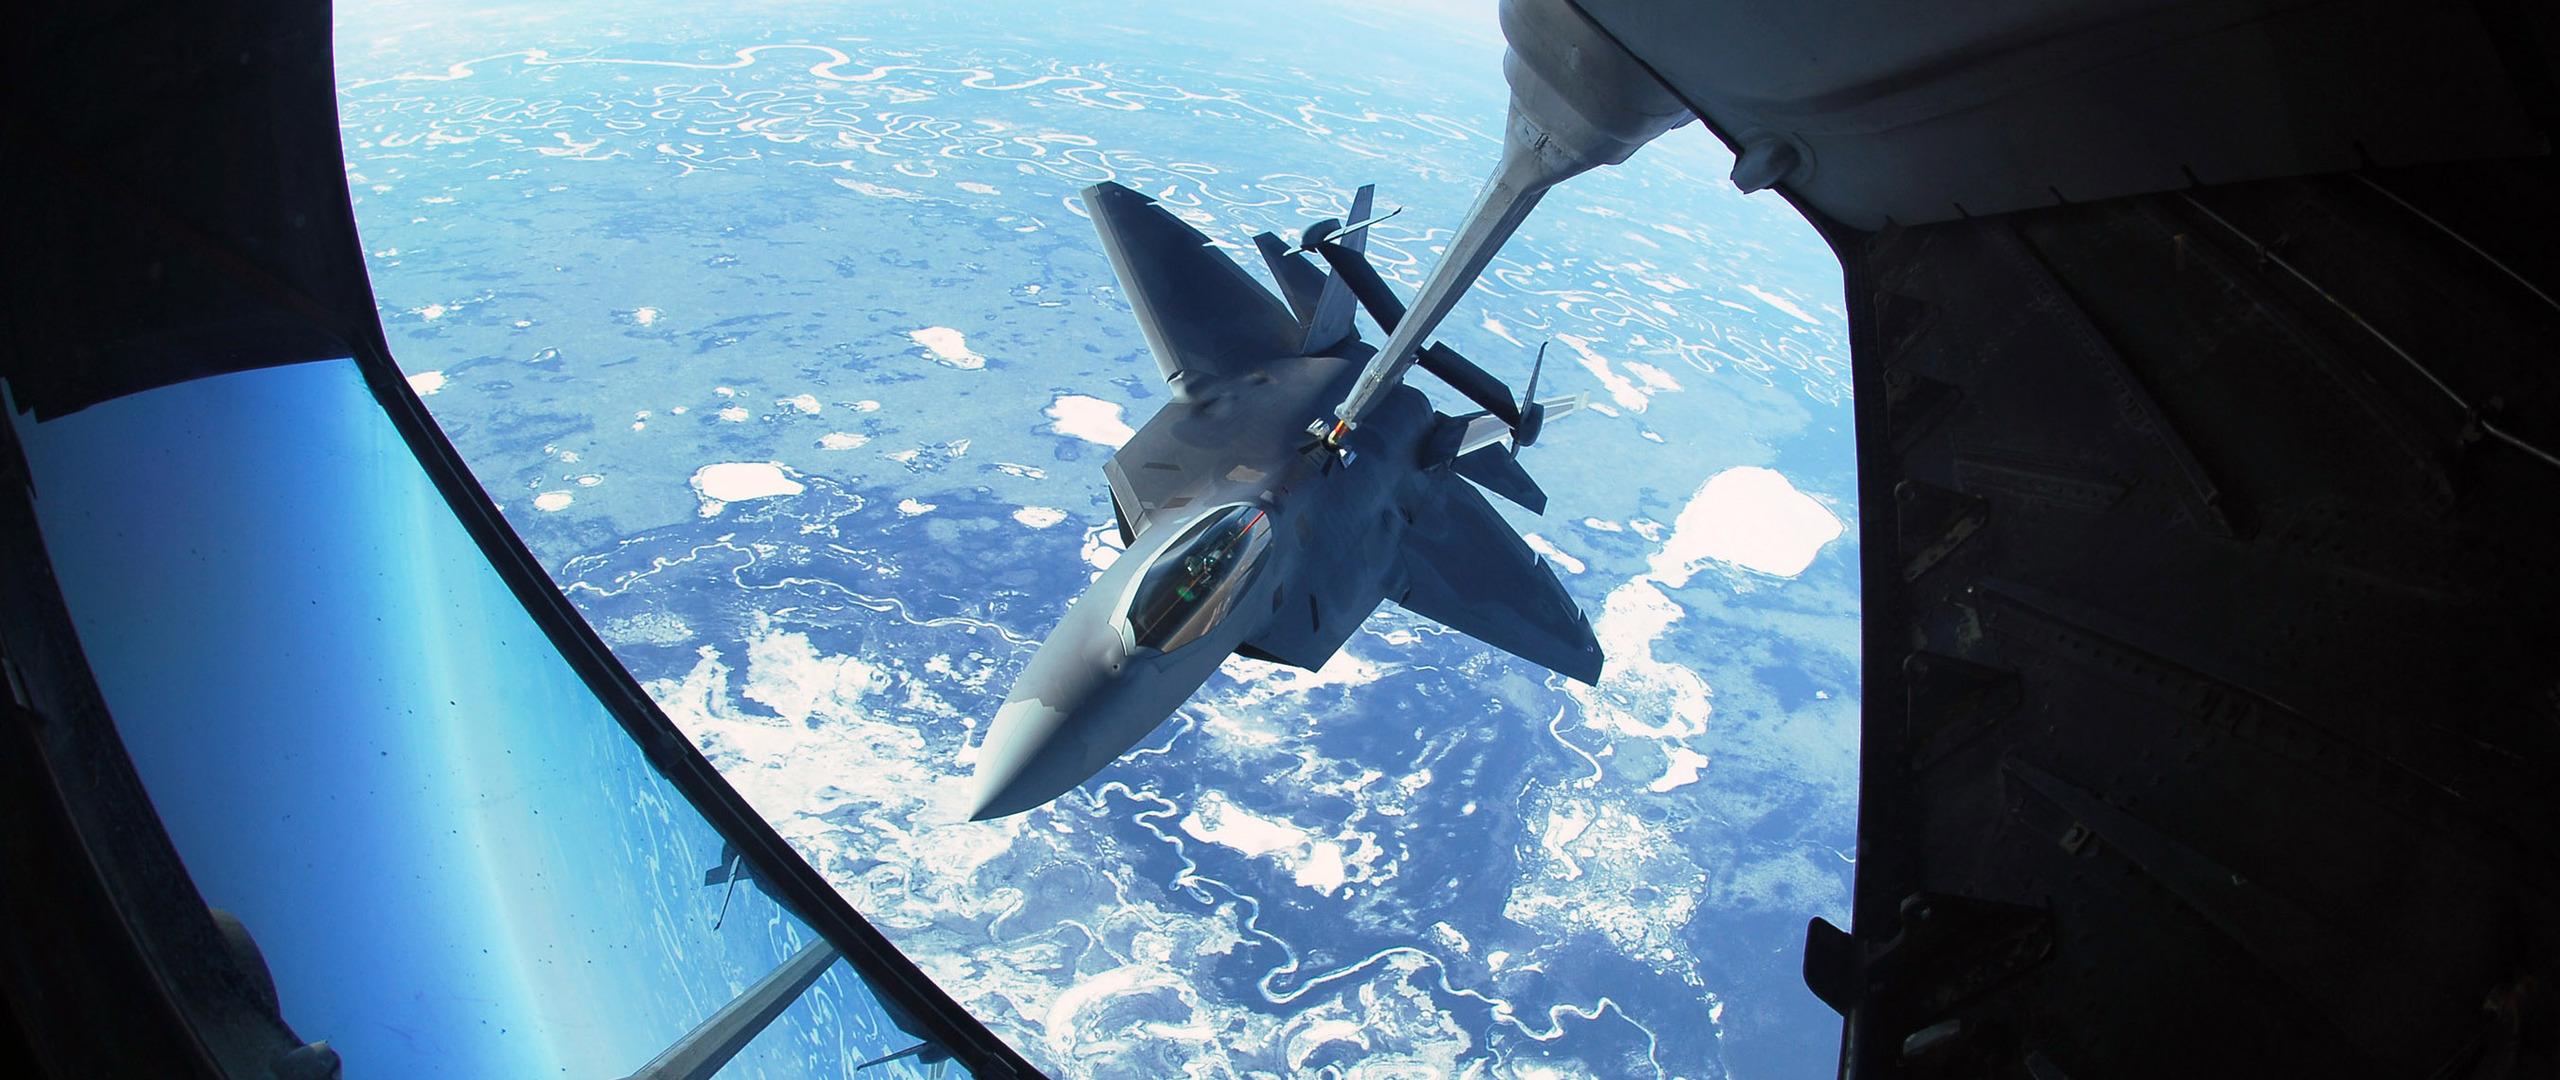 2560x1080 Lockheed Martin F 22 Raptor 2560x1080 Resolution Hd 4k